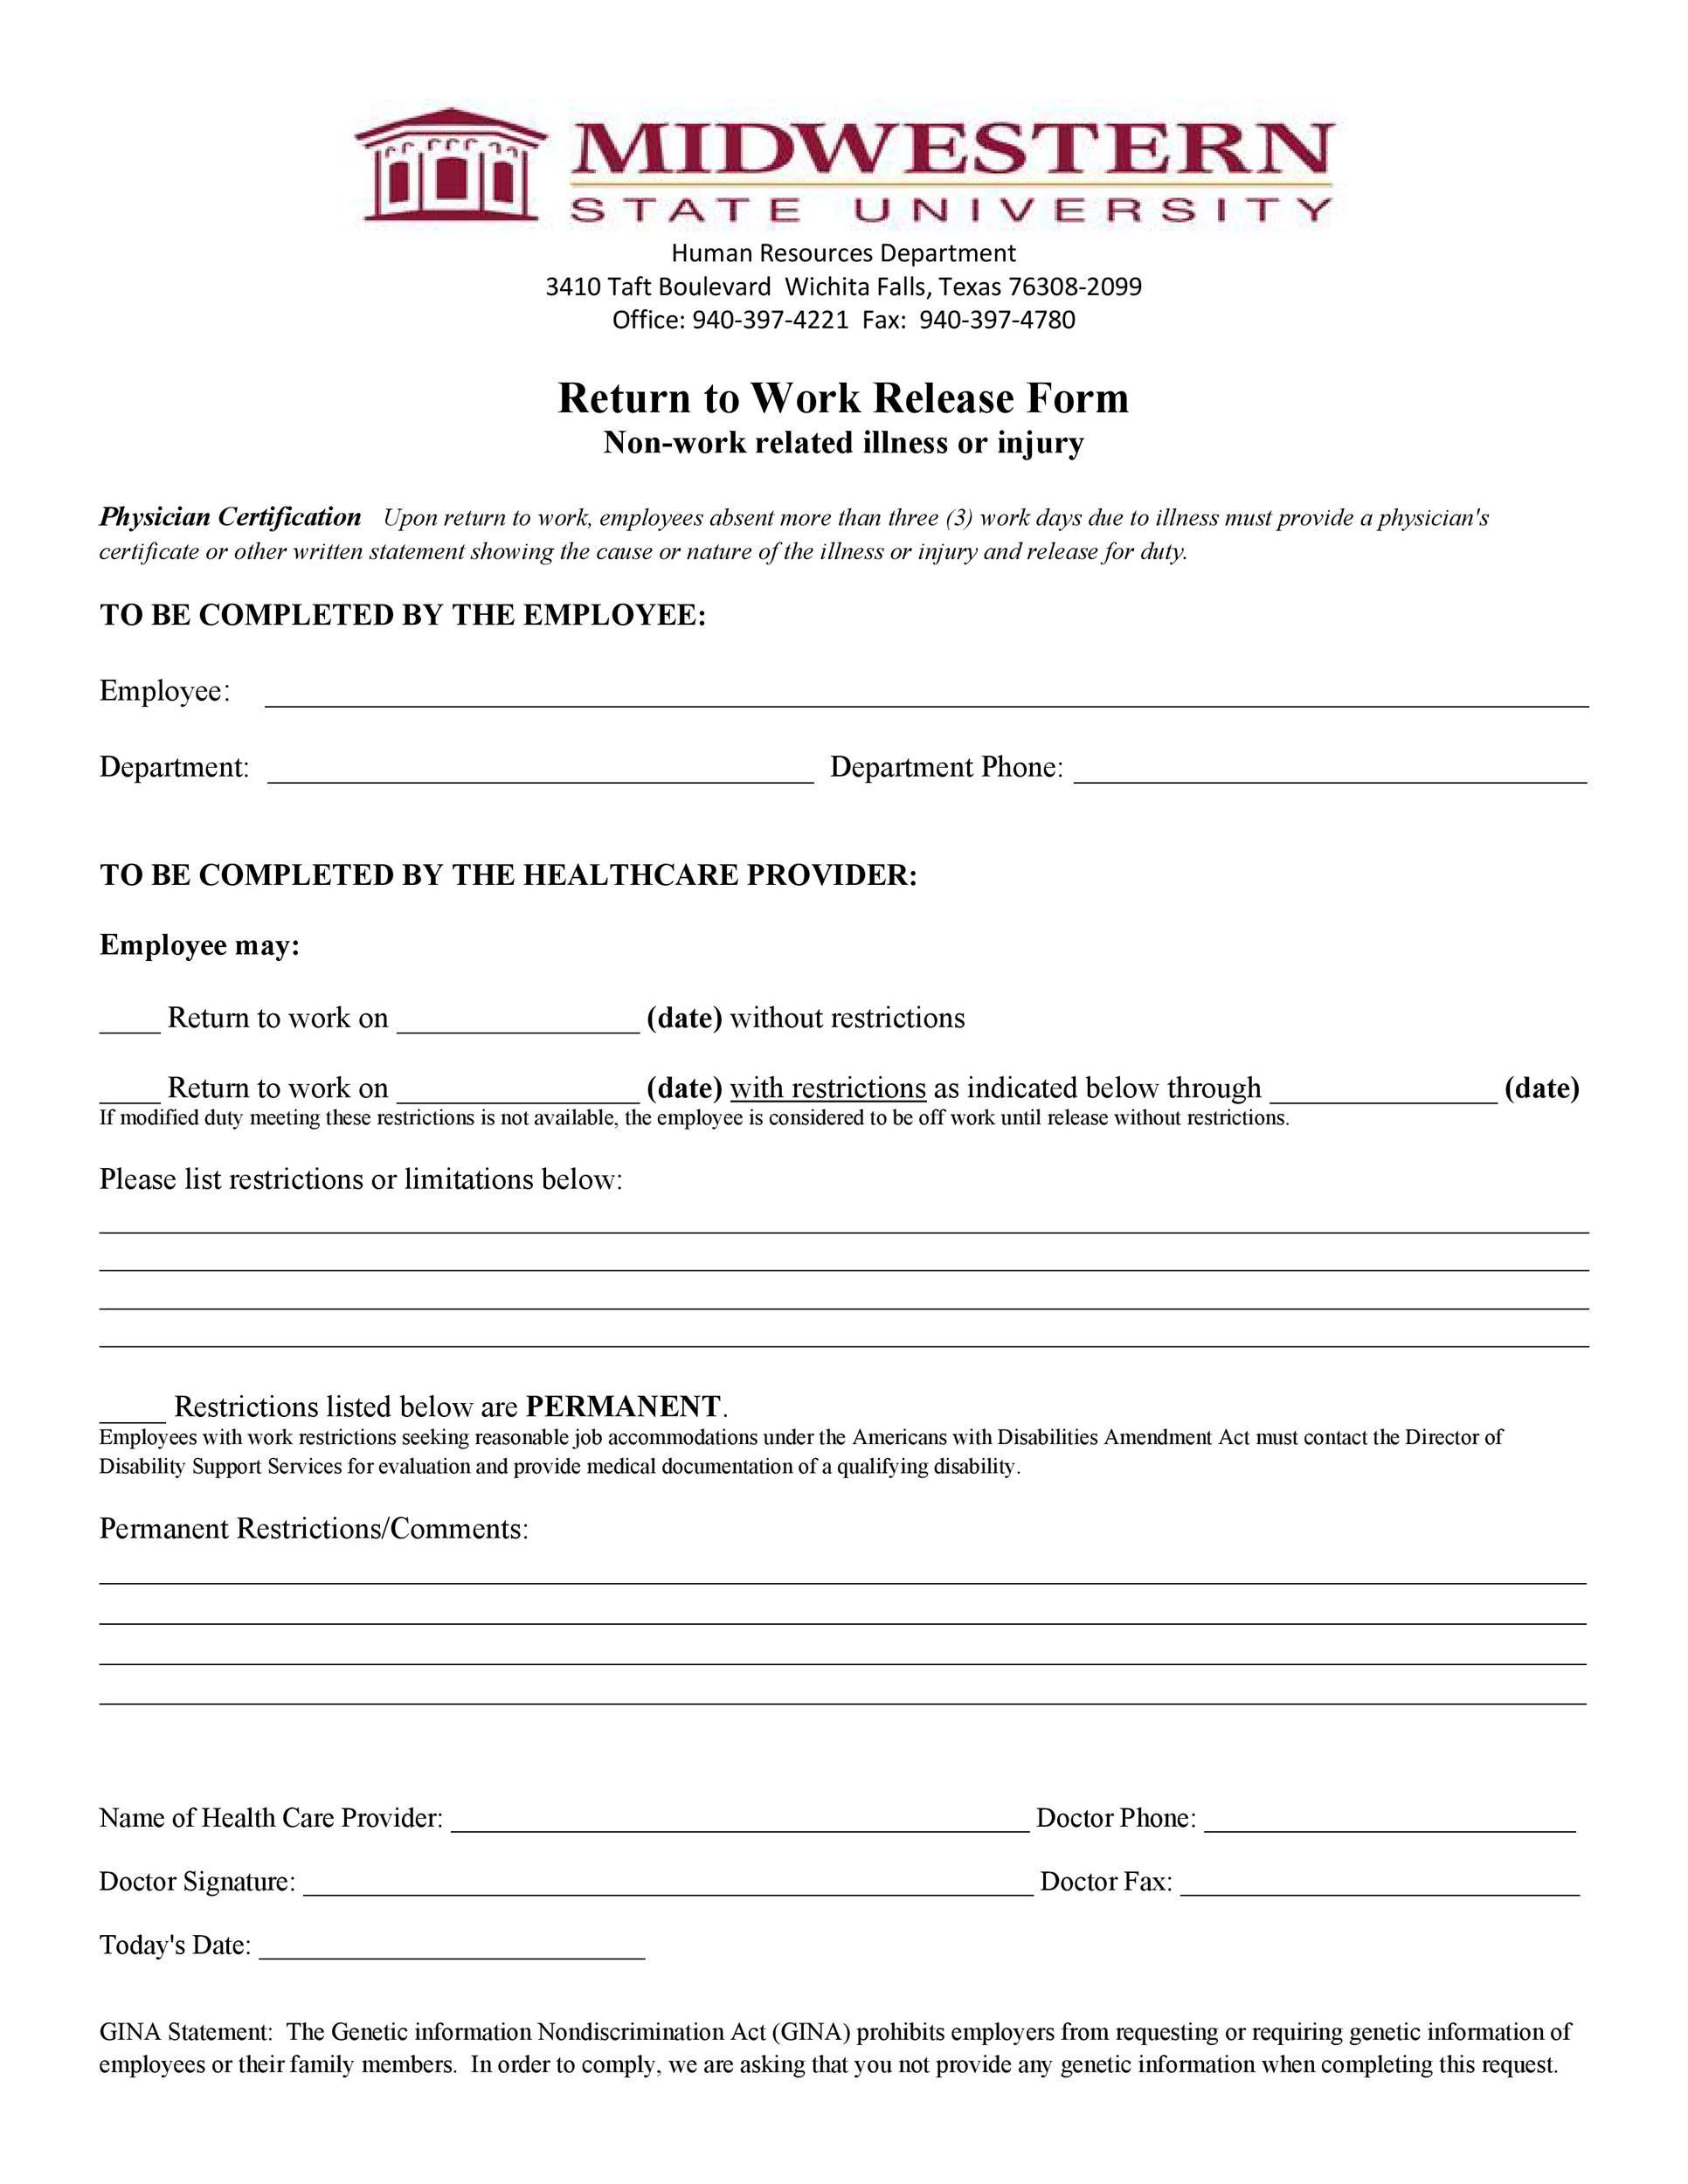 Free return to work form 20